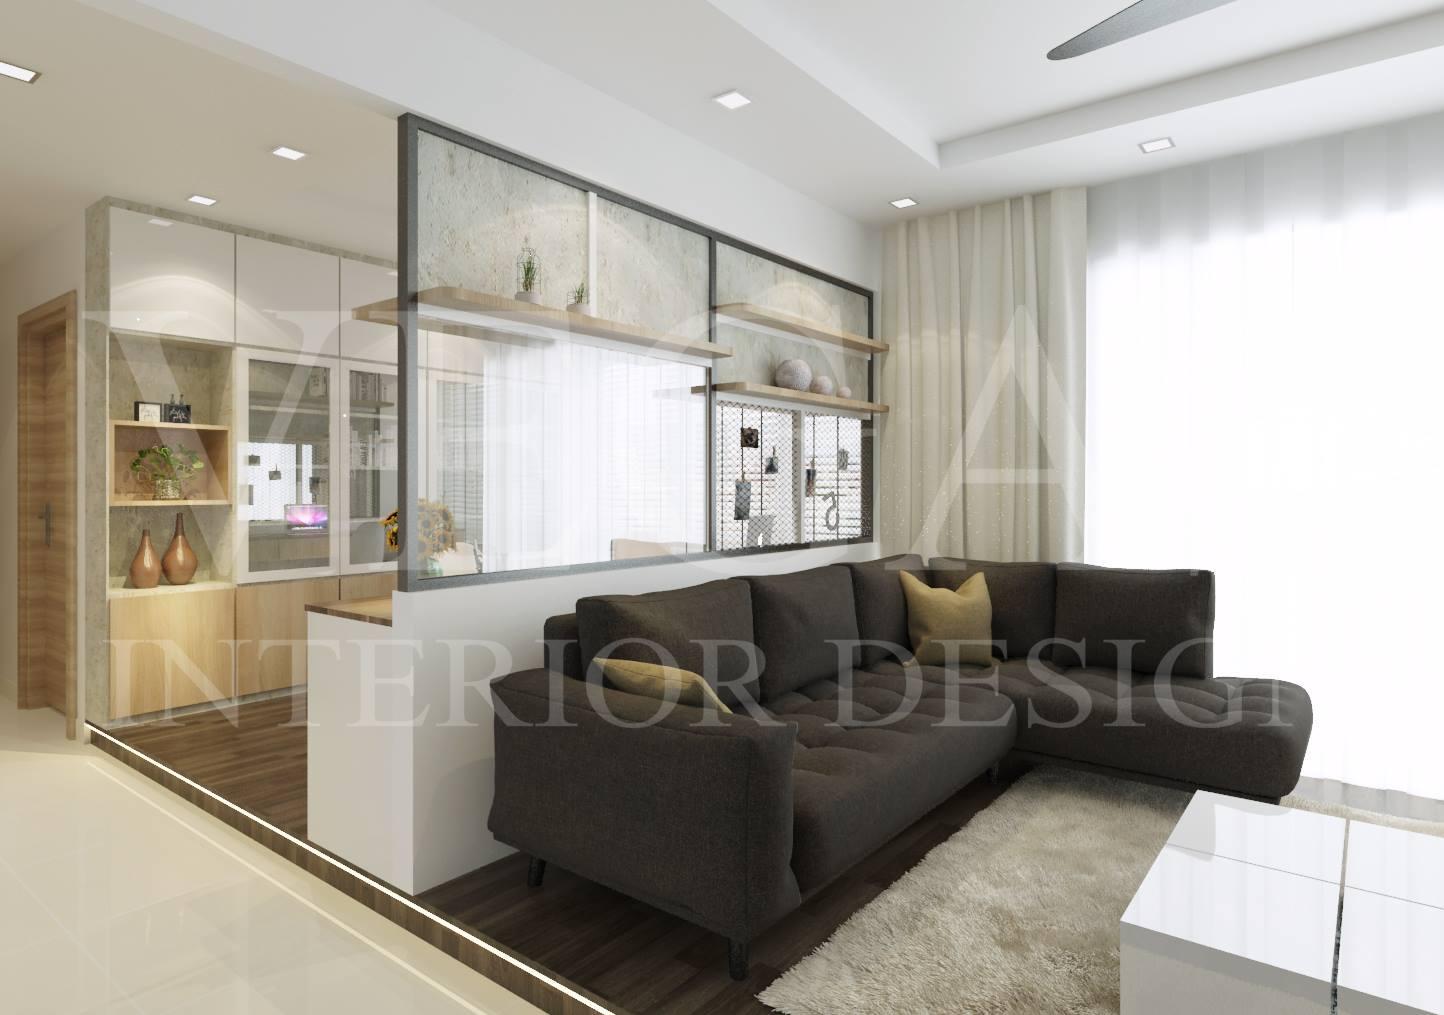 A Modern, Warm And Elegant House